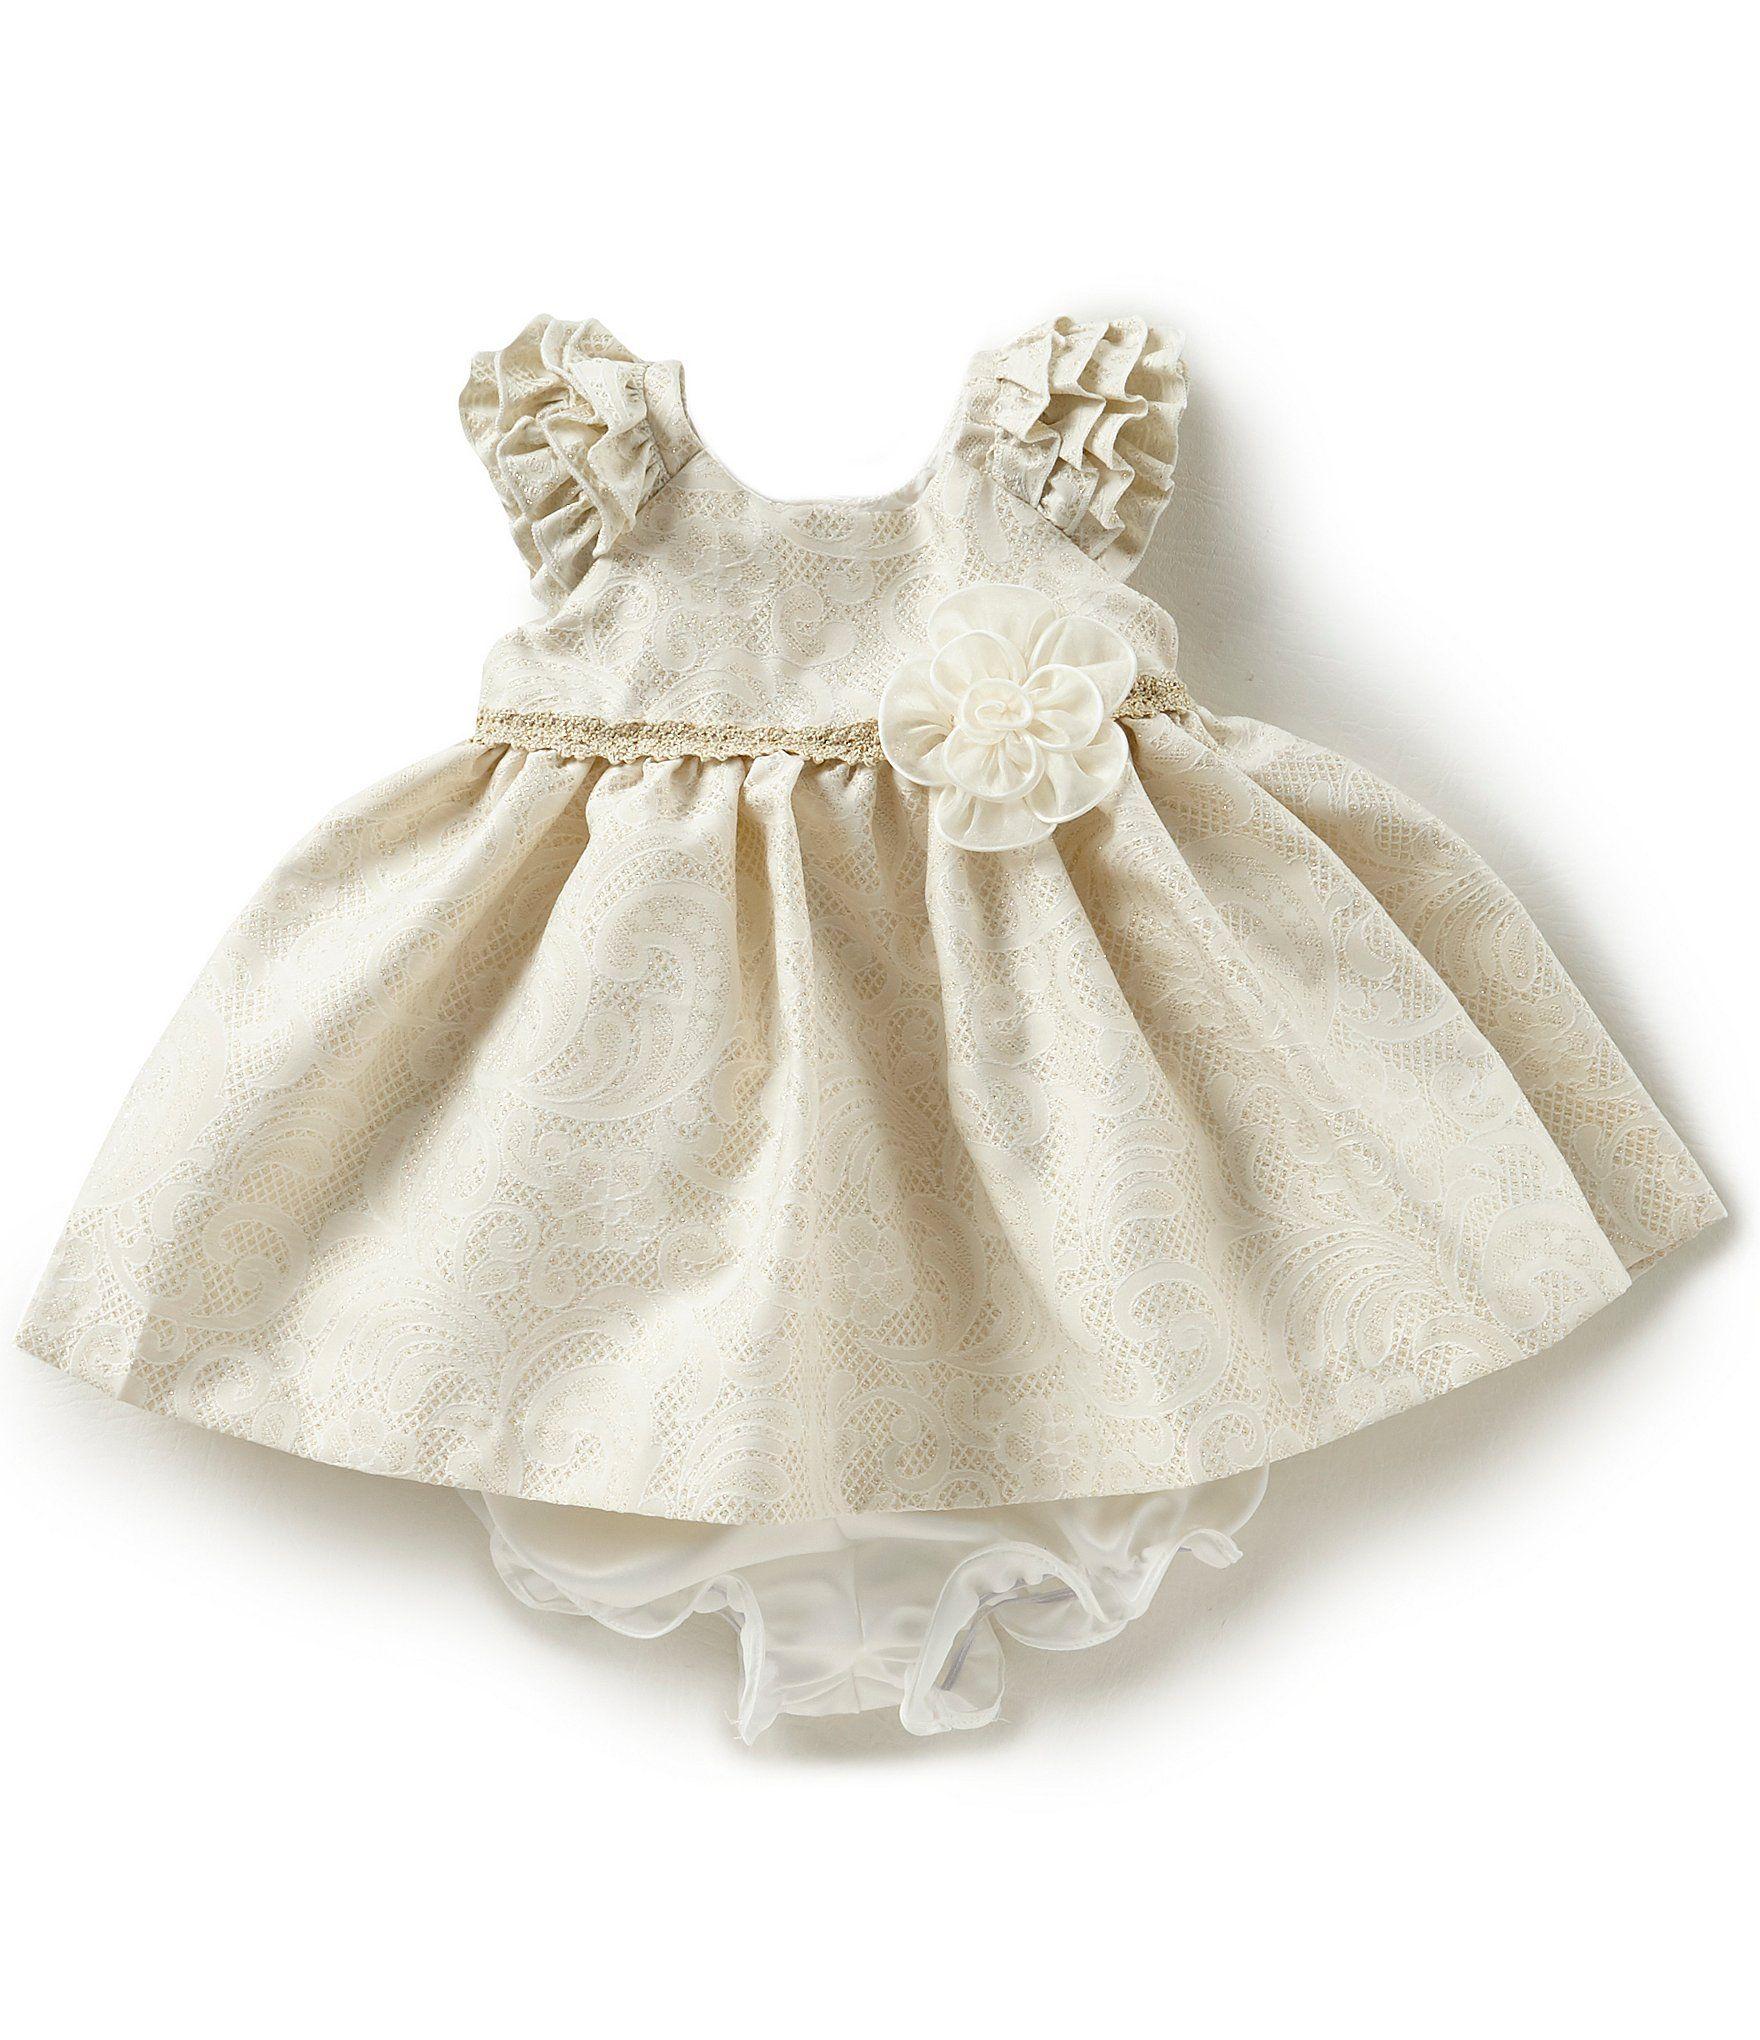 bf4247b3c01 Shop for Laura Ashley London Baby Girls Newborn-24 Months  Metallic-Patterned Brocade Dress at Dillards.com. Visit Dillards.com to  find clothing